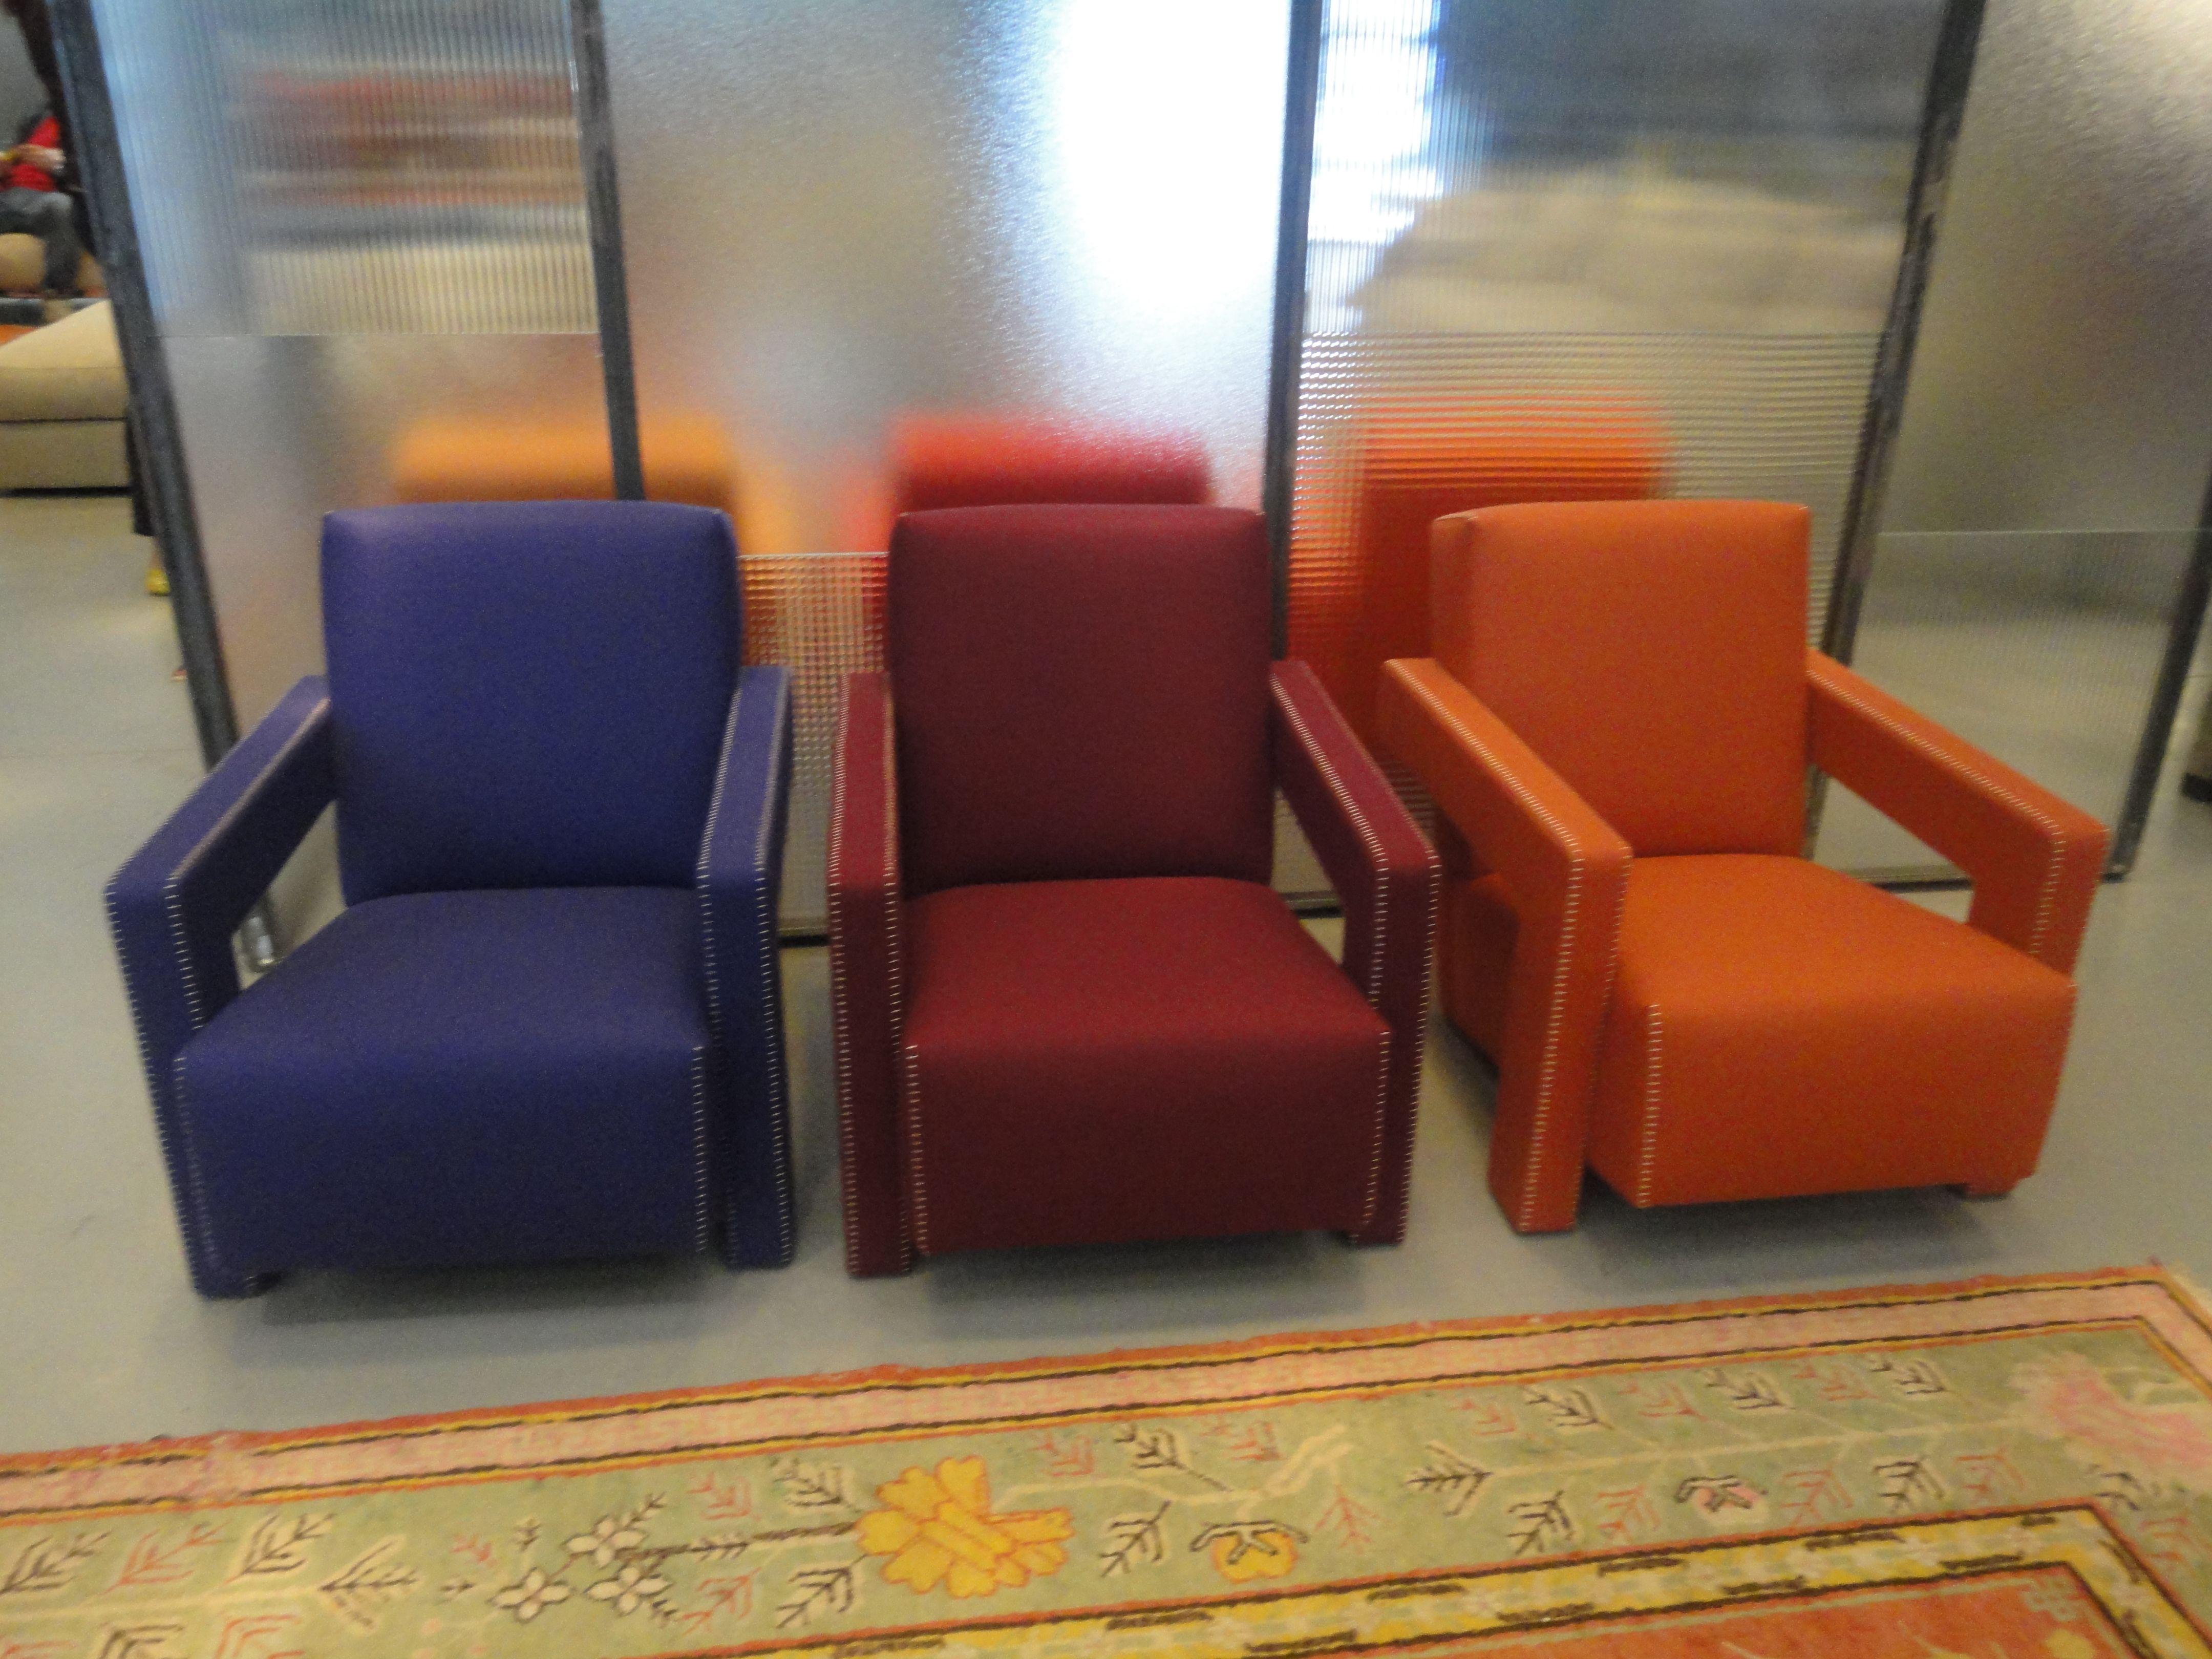 Cassina cassina italy upholstered furniture for Cassina italy